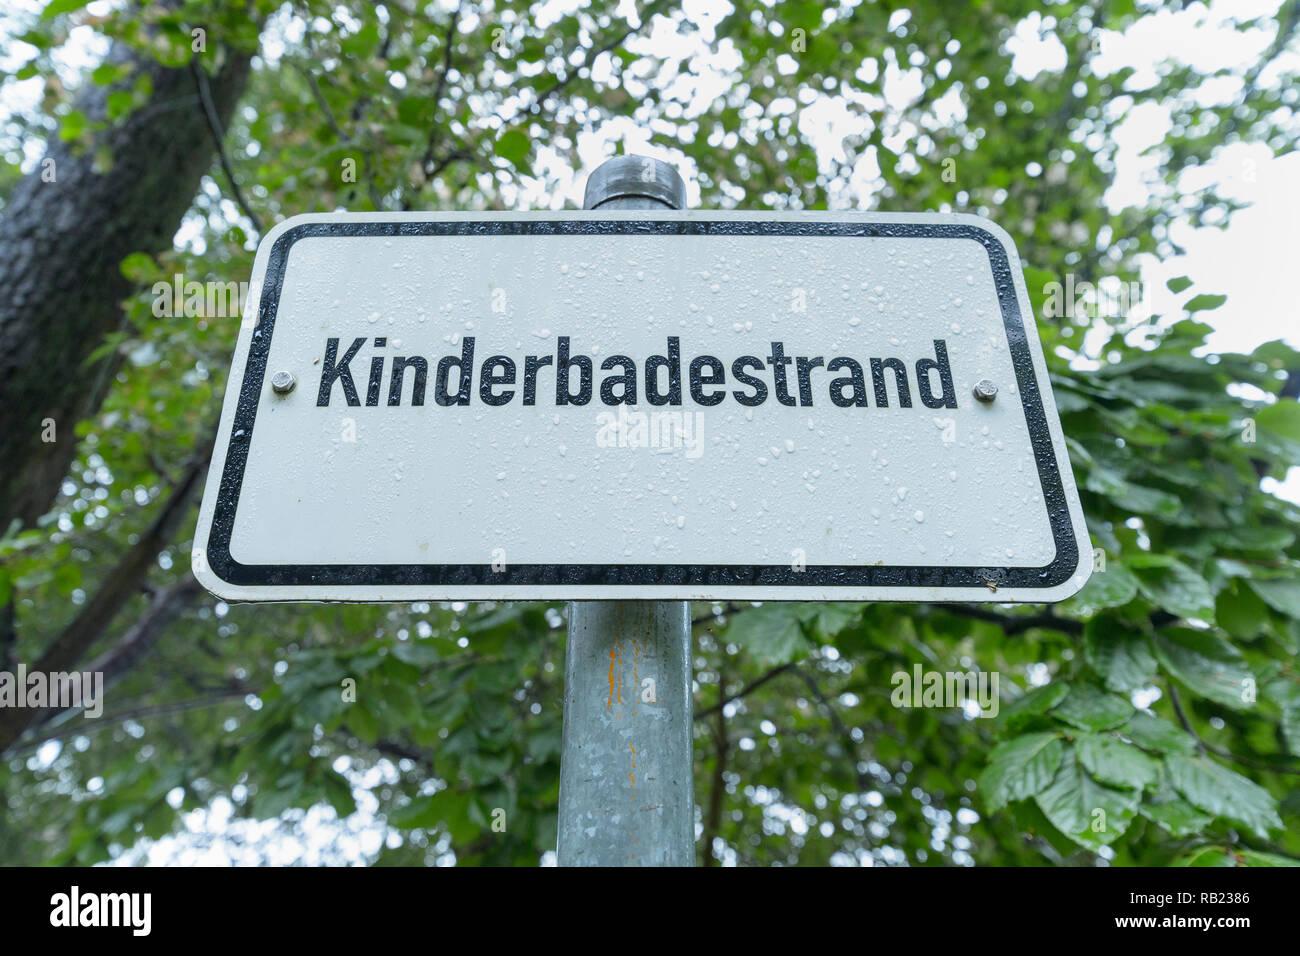 Children's beach sign, Lake Großer Stechlinsee, Neuglobsow, Rheinsberg, Ruppiner Land, Brandenburg, Germany - Stock Image